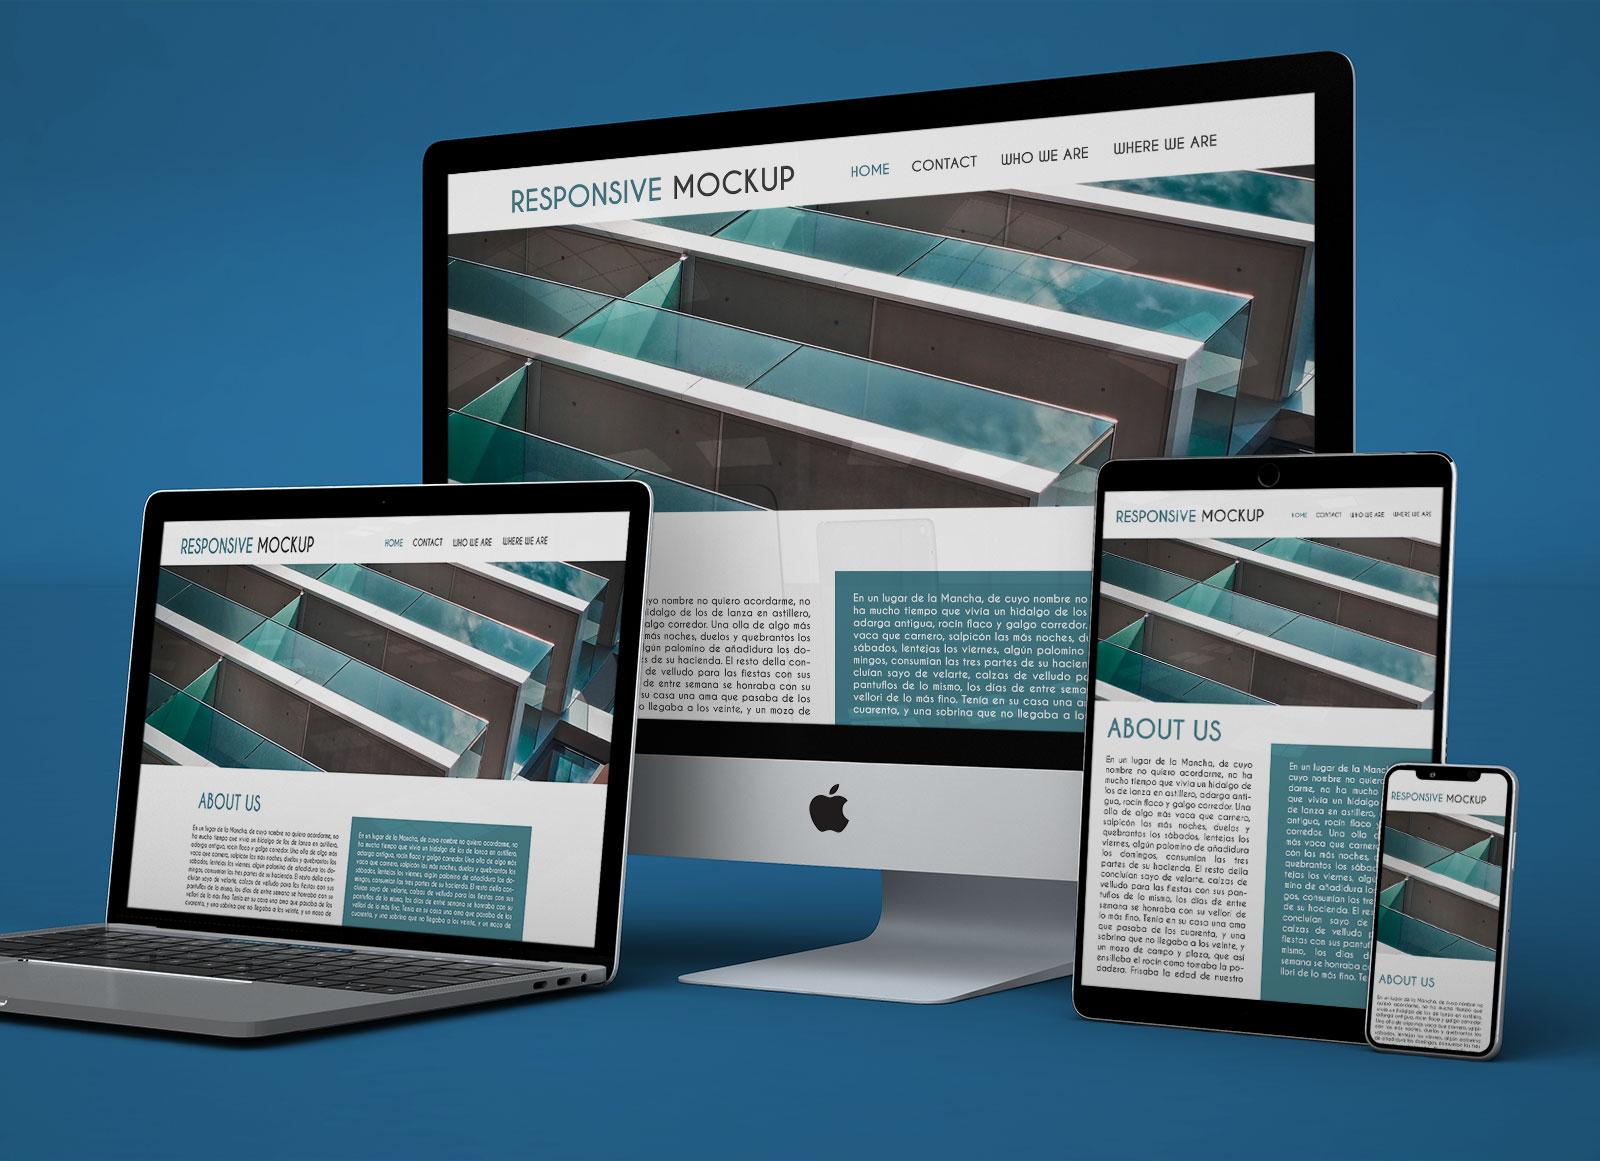 Free-Perspective-Responsive-Webiste-Mockup-PSD